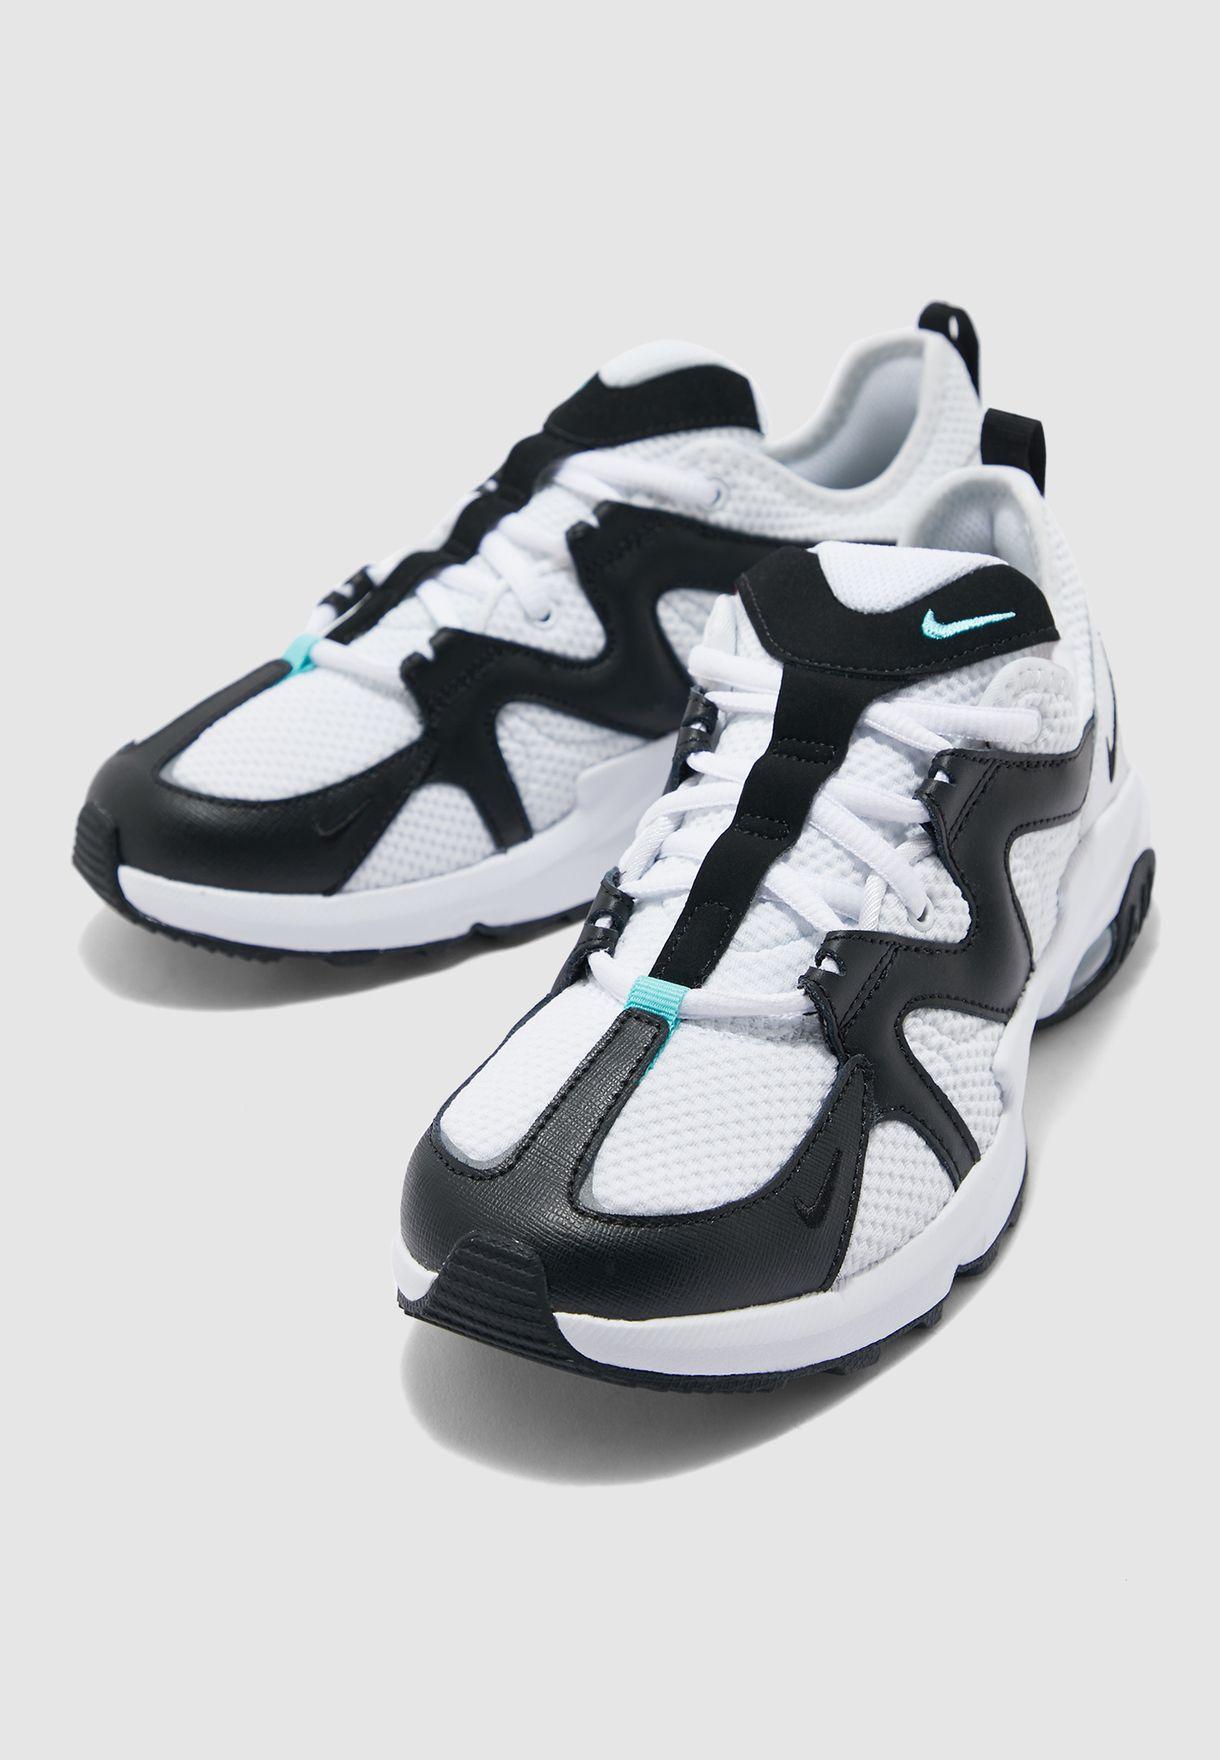 Nike Air Max Graviton Women whiteblack ab 79,89